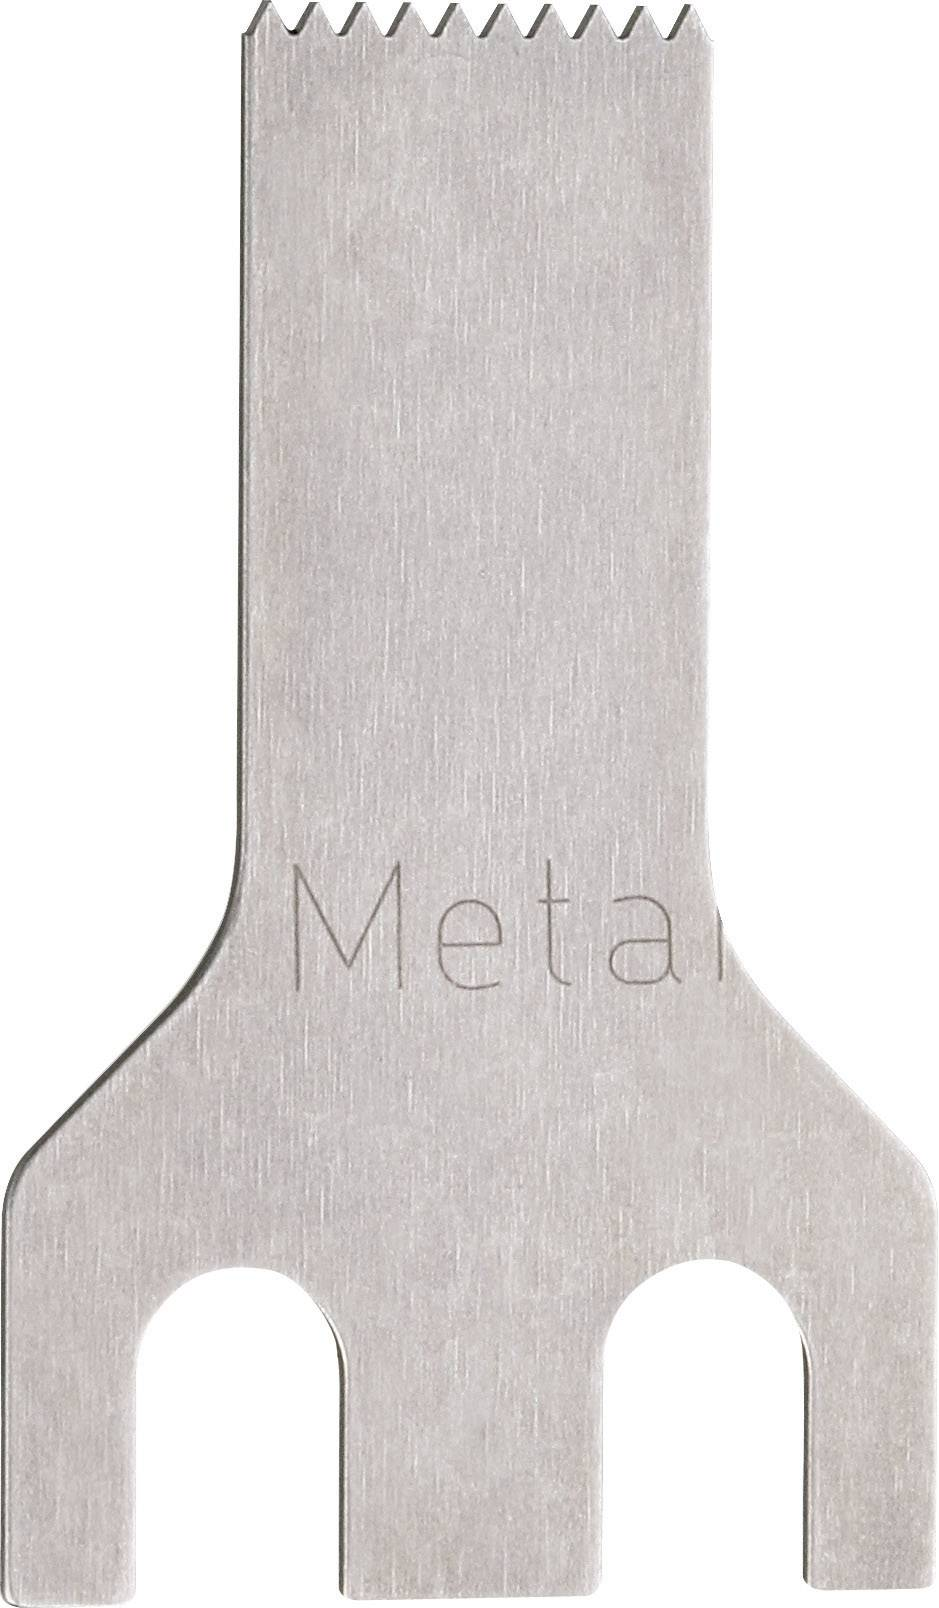 Pilové listy HSS MiniCut 2 ks, 10 mm